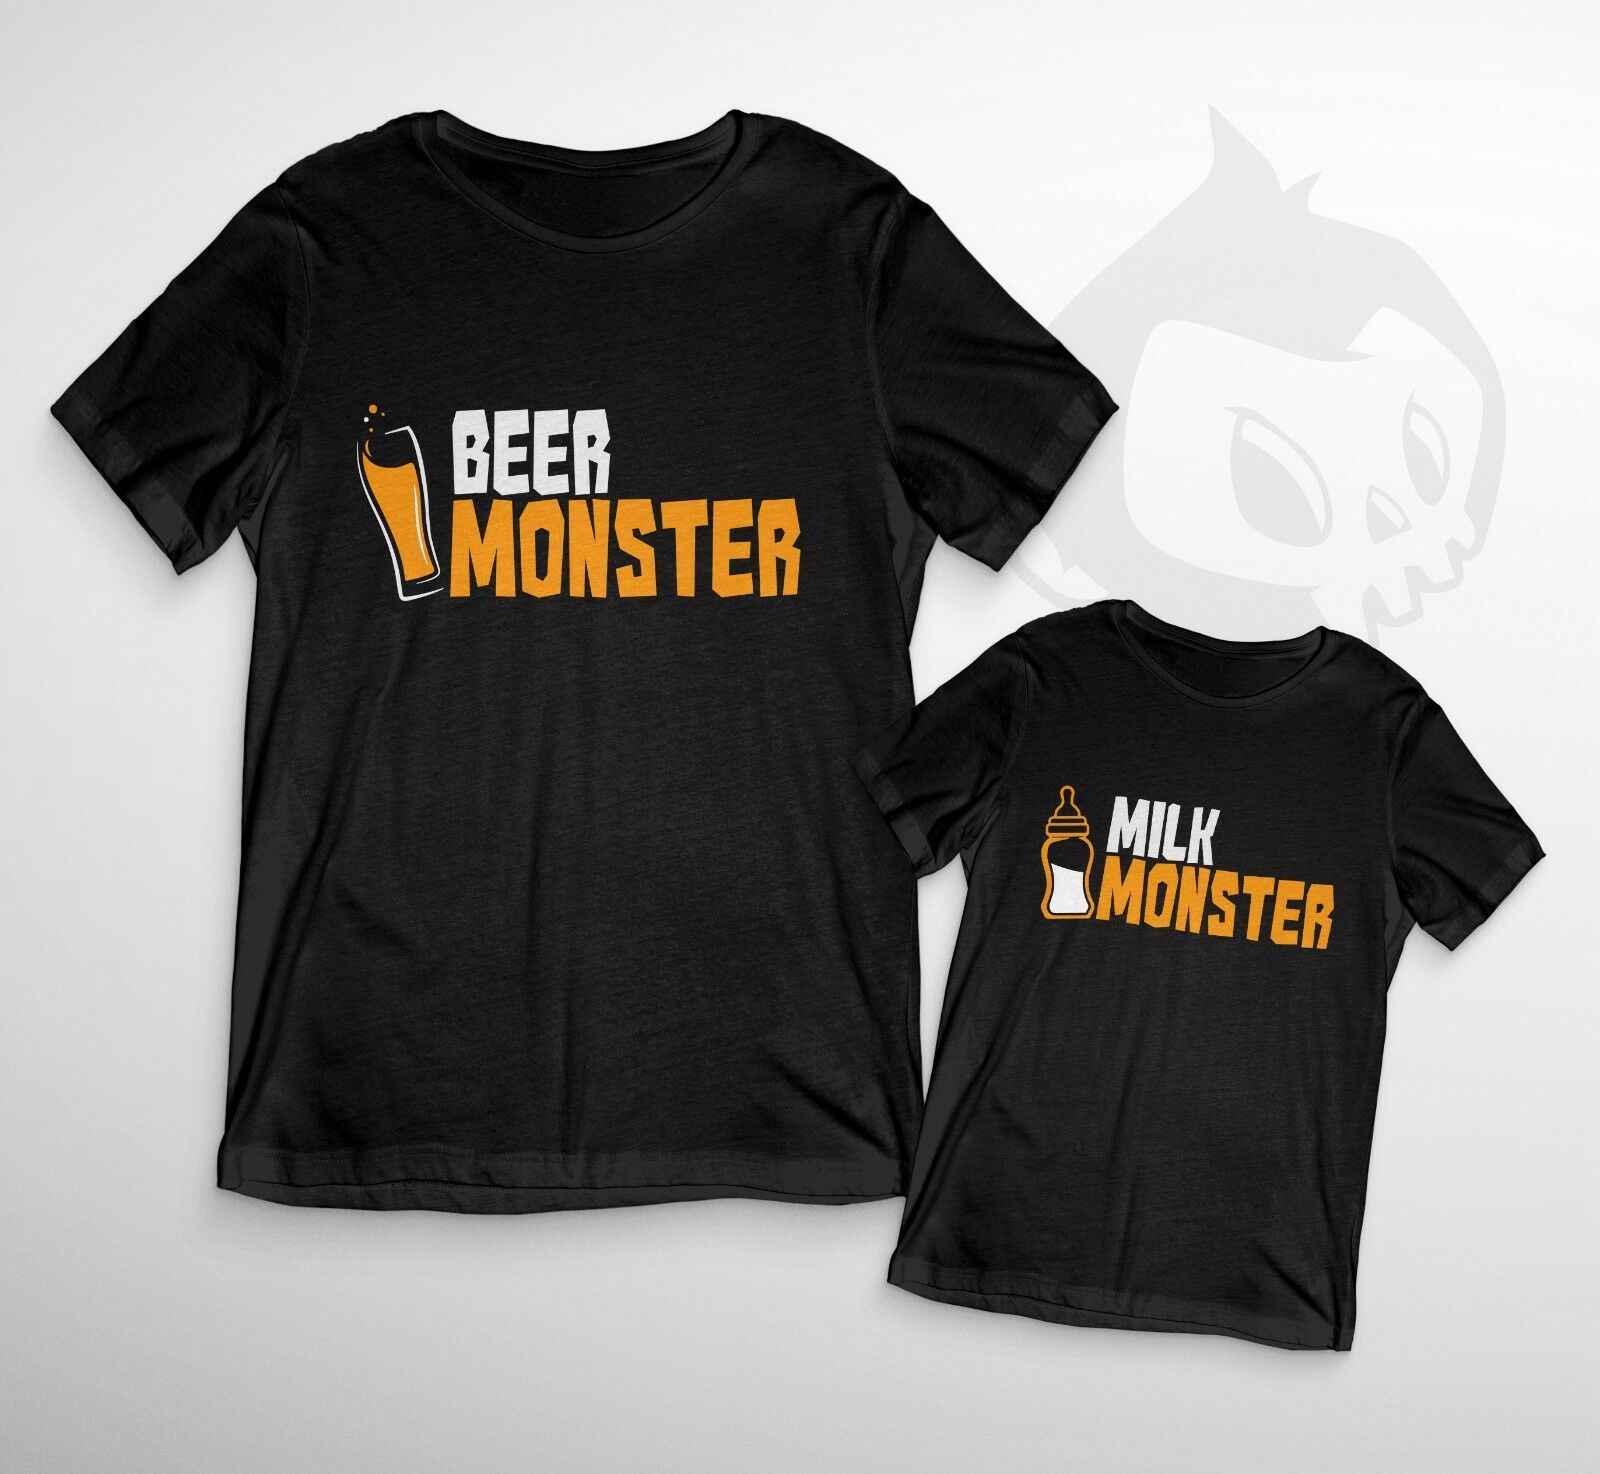 Bier & Melk Monster Duo T-Shirt-Zoon Dochter Nieuwigheid Grappige Papa Baby Kids Cute2019 modieuze Merk 100% katoen Gedrukt ronde N